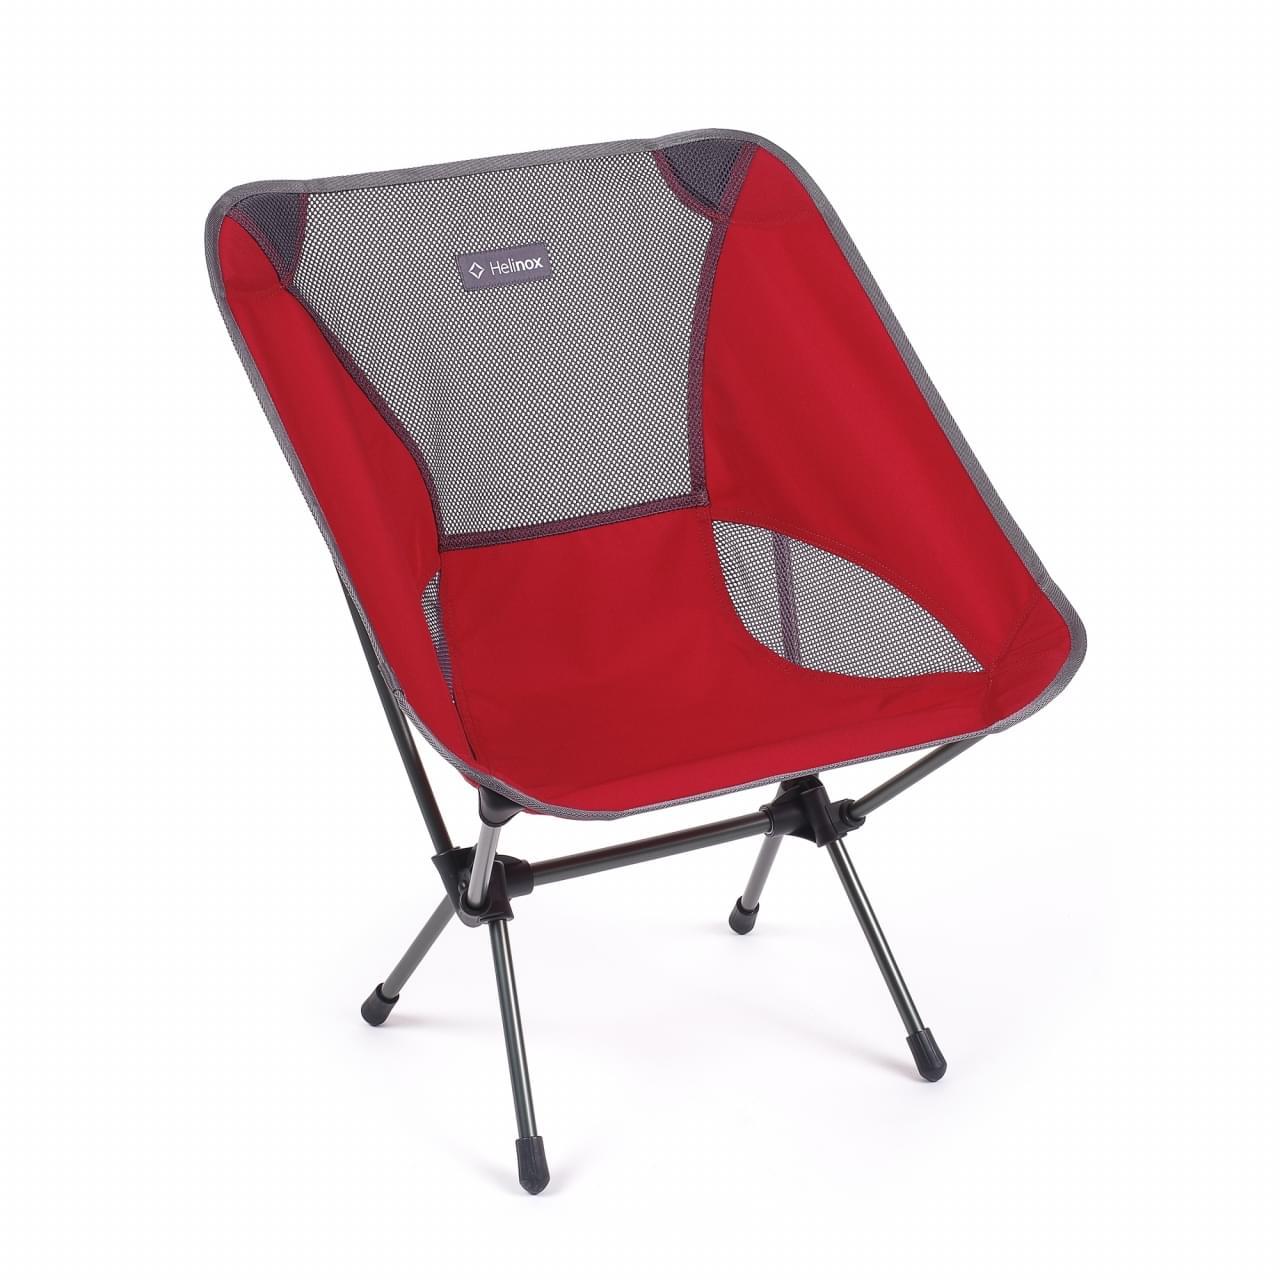 Helinox Chair One Lichtgewicht Stoel Rood